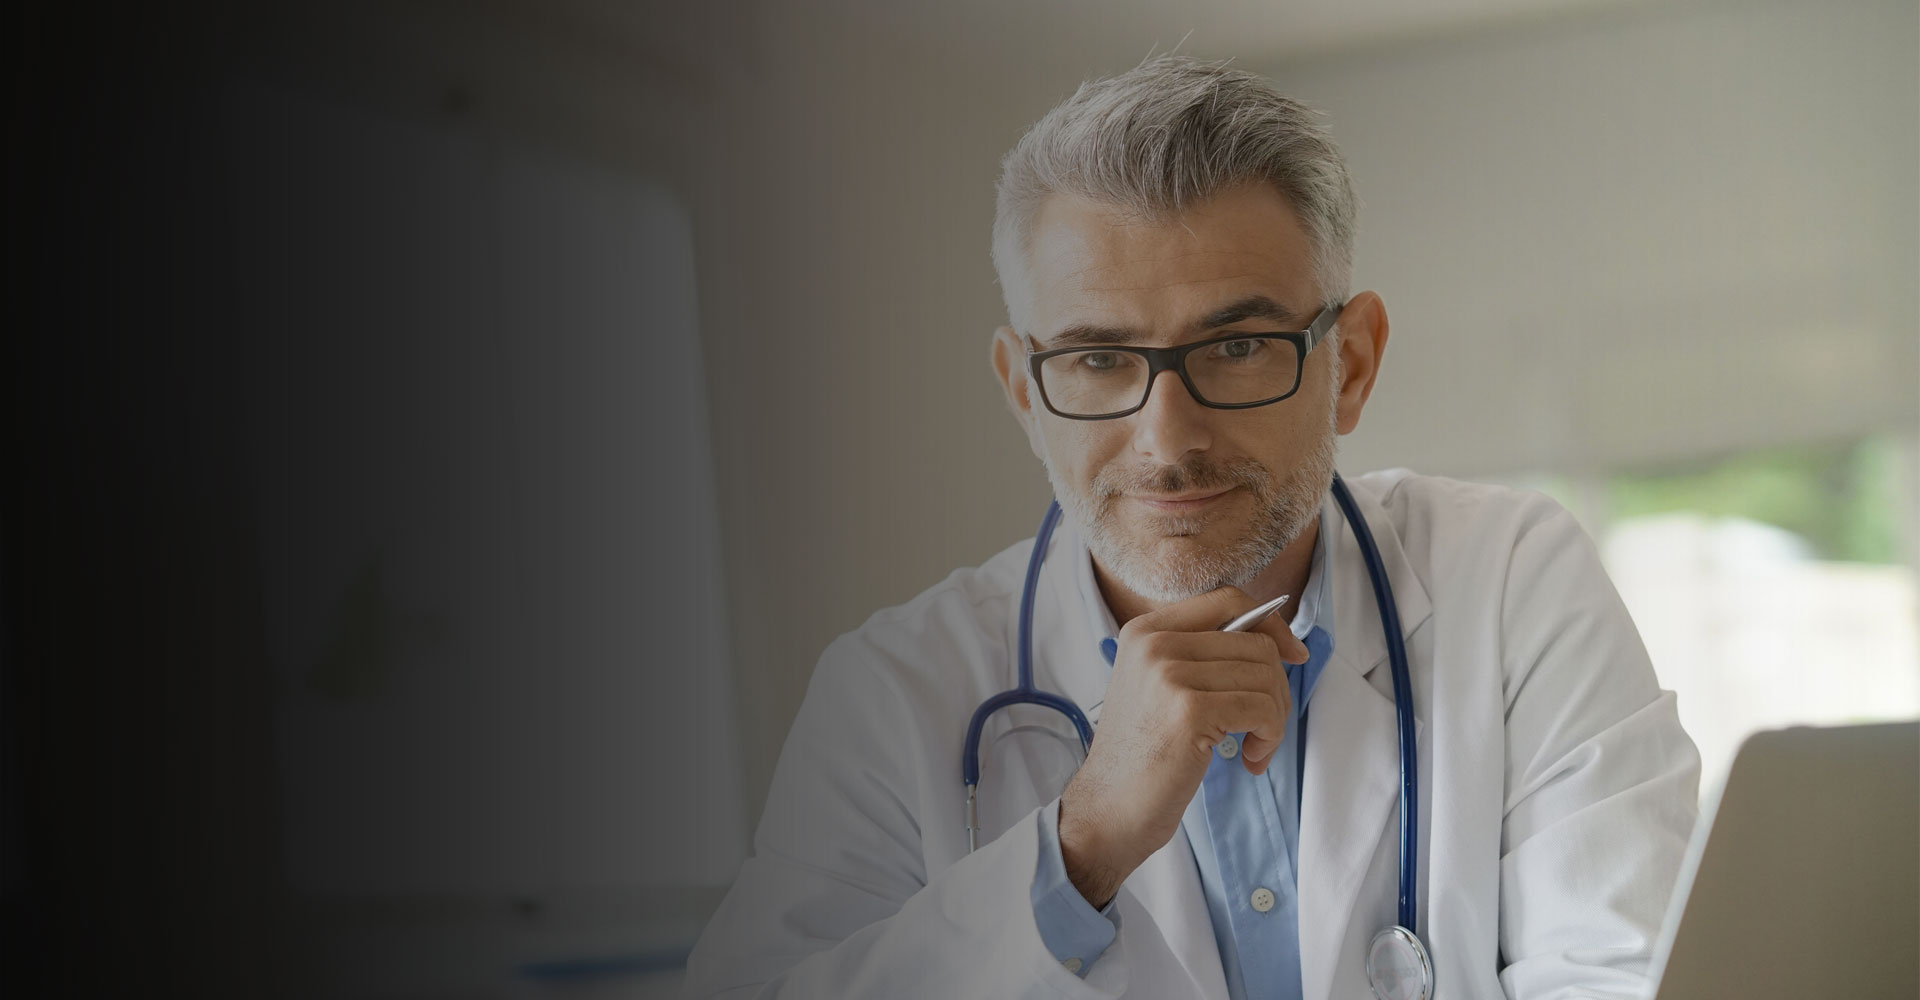 Spécialités médicales